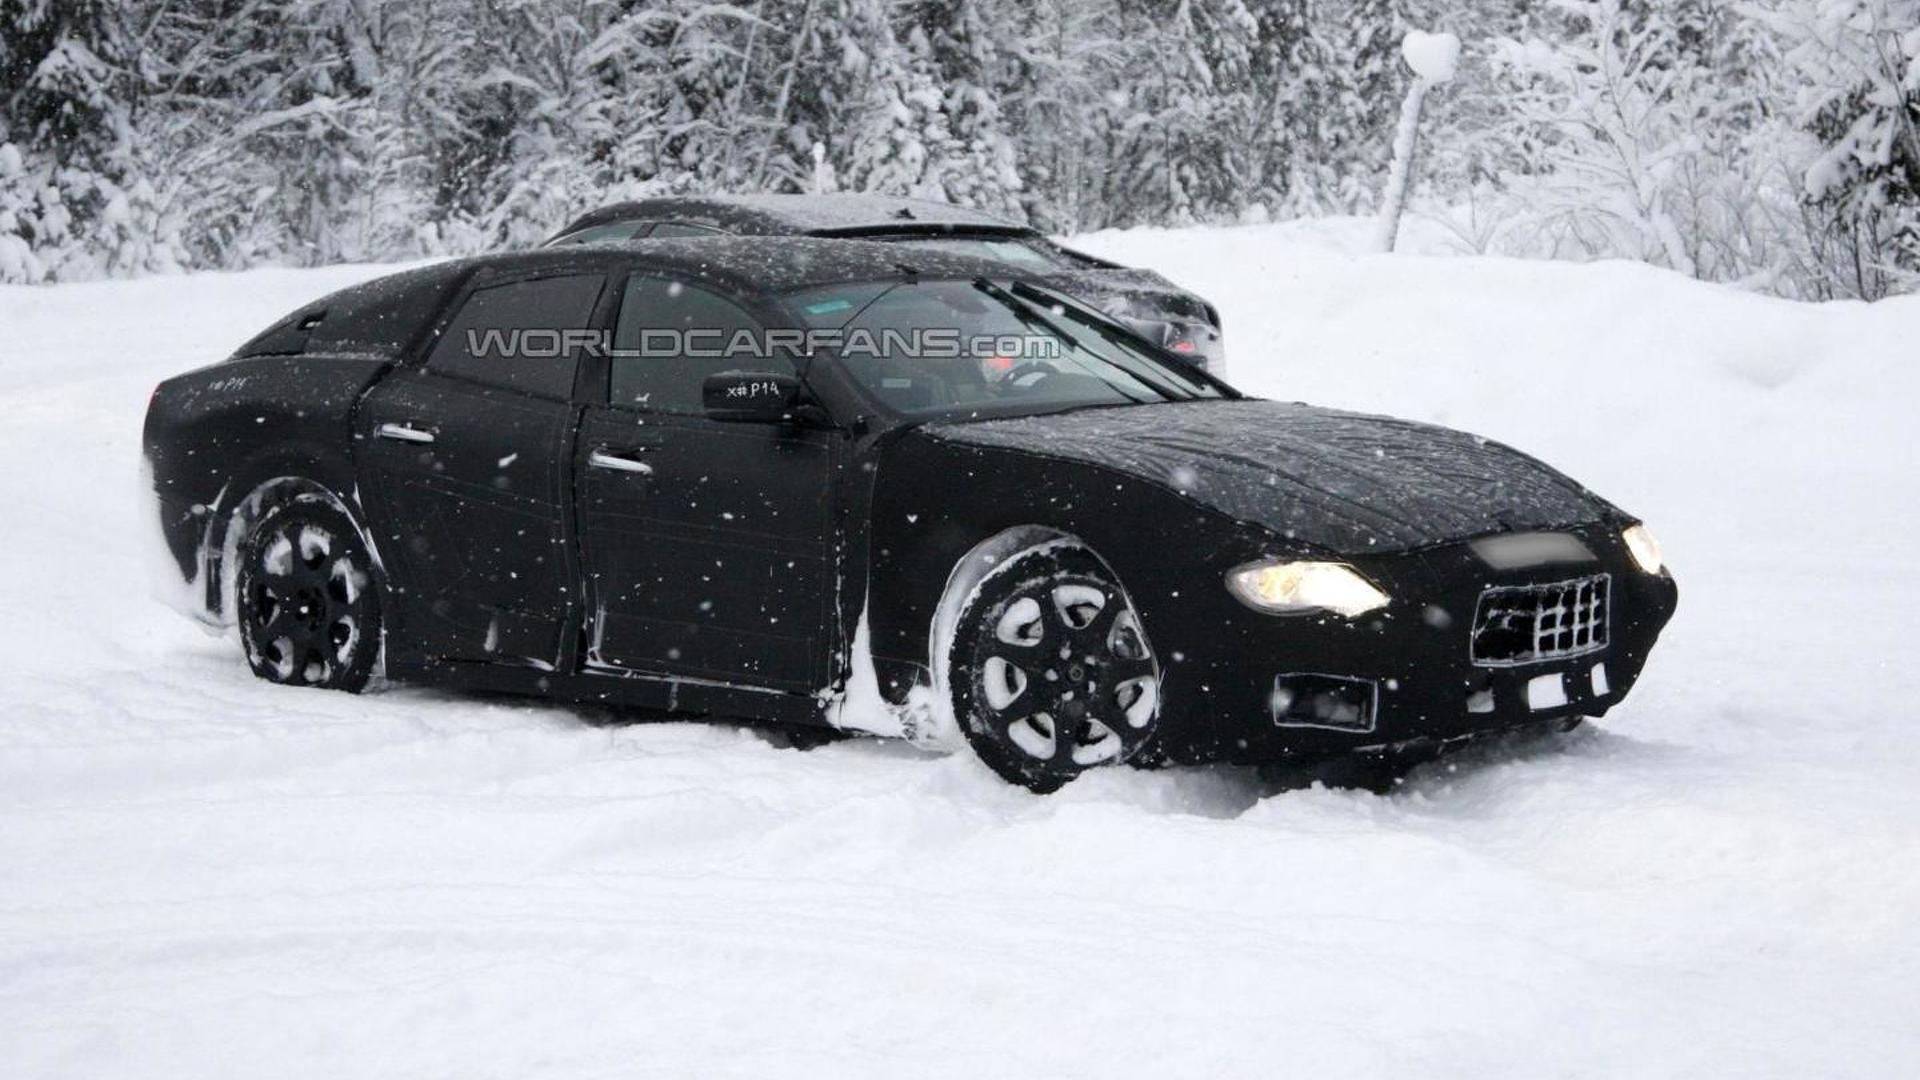 2013 Maserati Ghibli details emerge, to debut in April